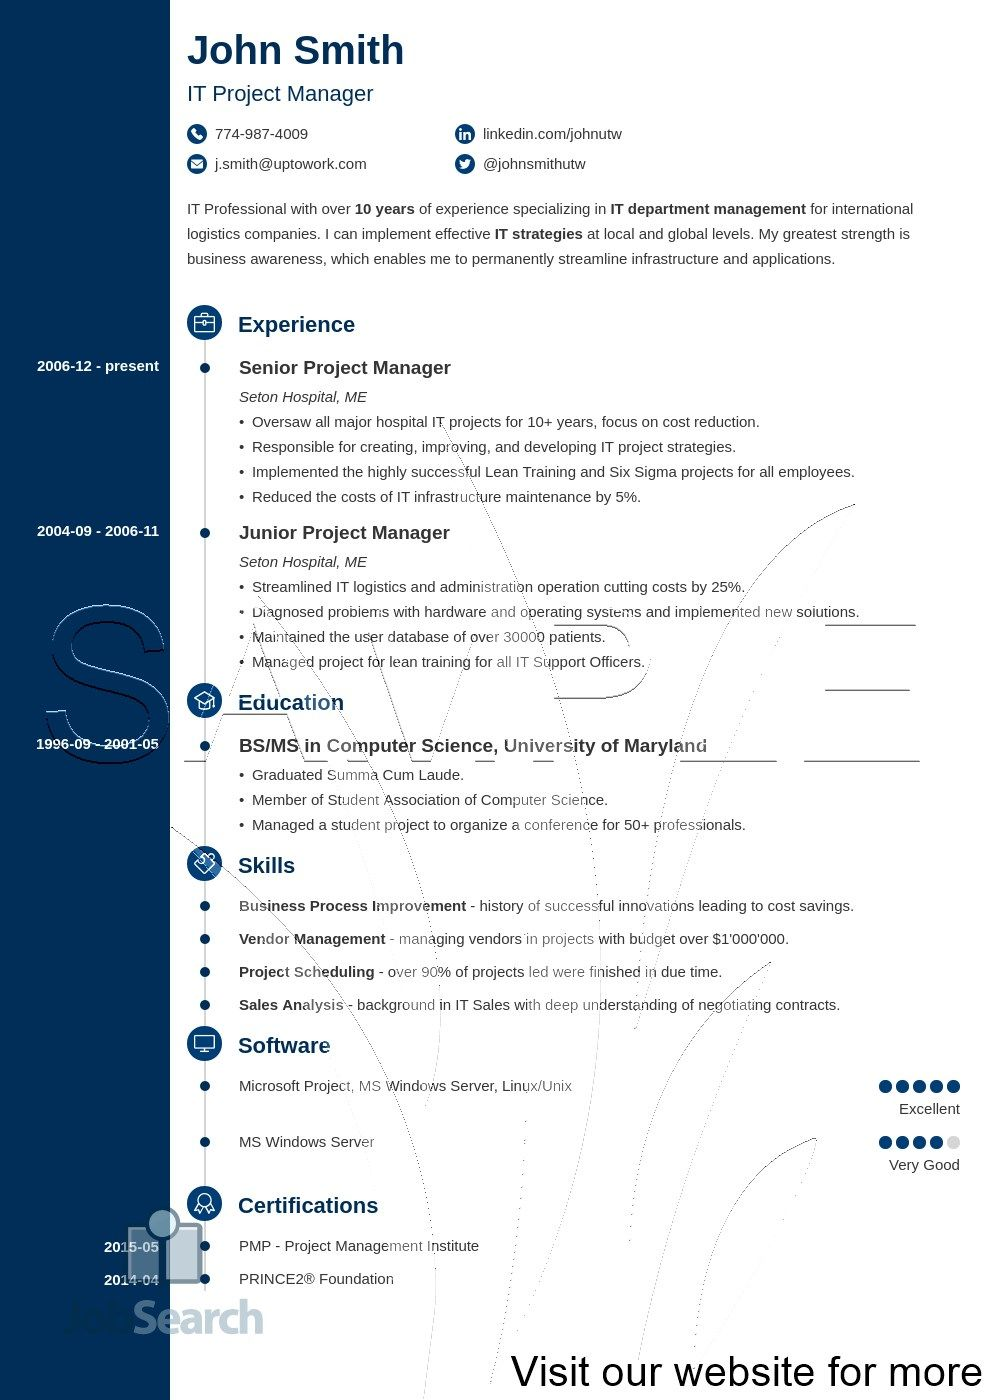 cv design creative 2020, cv design professional, cv design